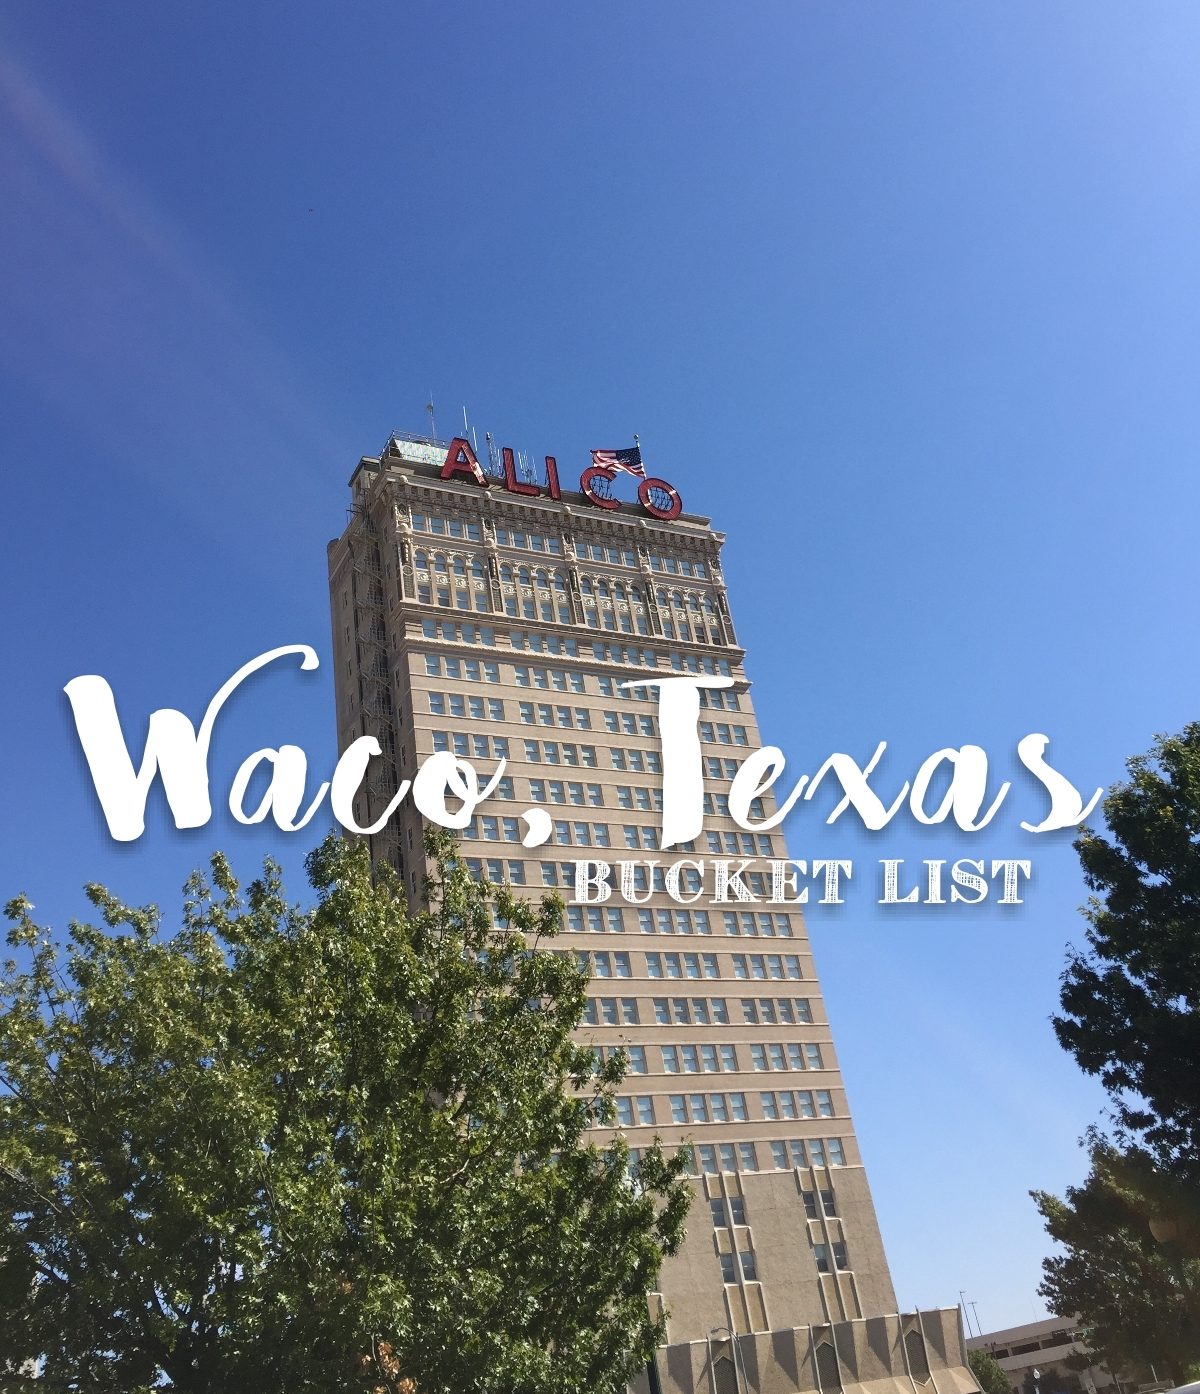 Texas Bucket List Map Waco, Texas bucket list   Discovereighng with Dana Travel